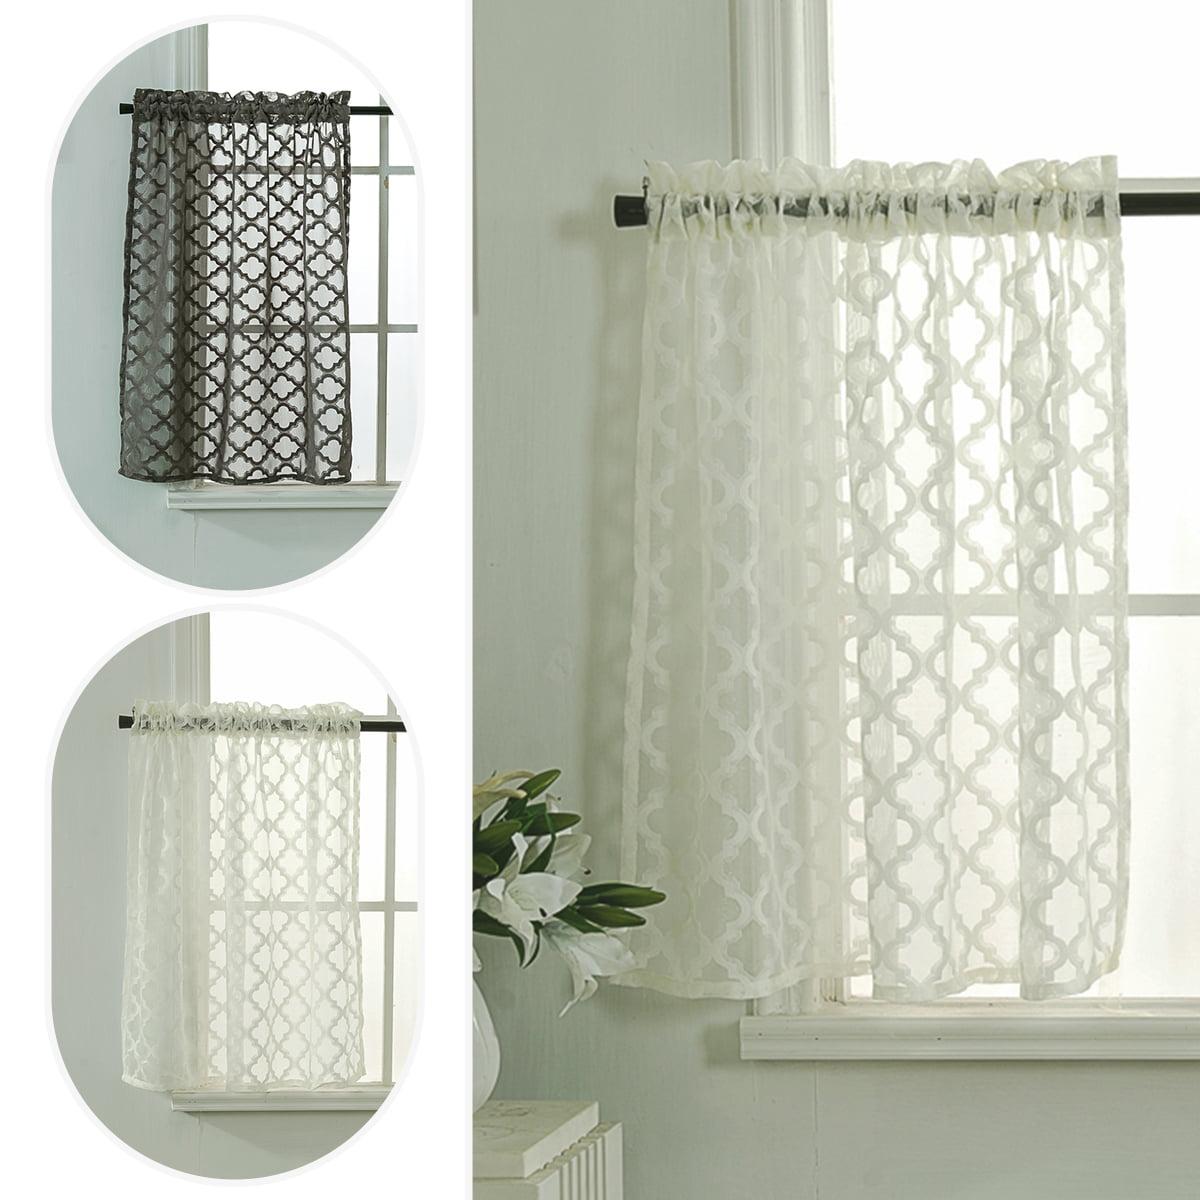 Sheer Kitchen Tiers Curtains Rhombus Jacquard Short Half Window Drapes Valance Home Decoration Walmart Com Walmart Com